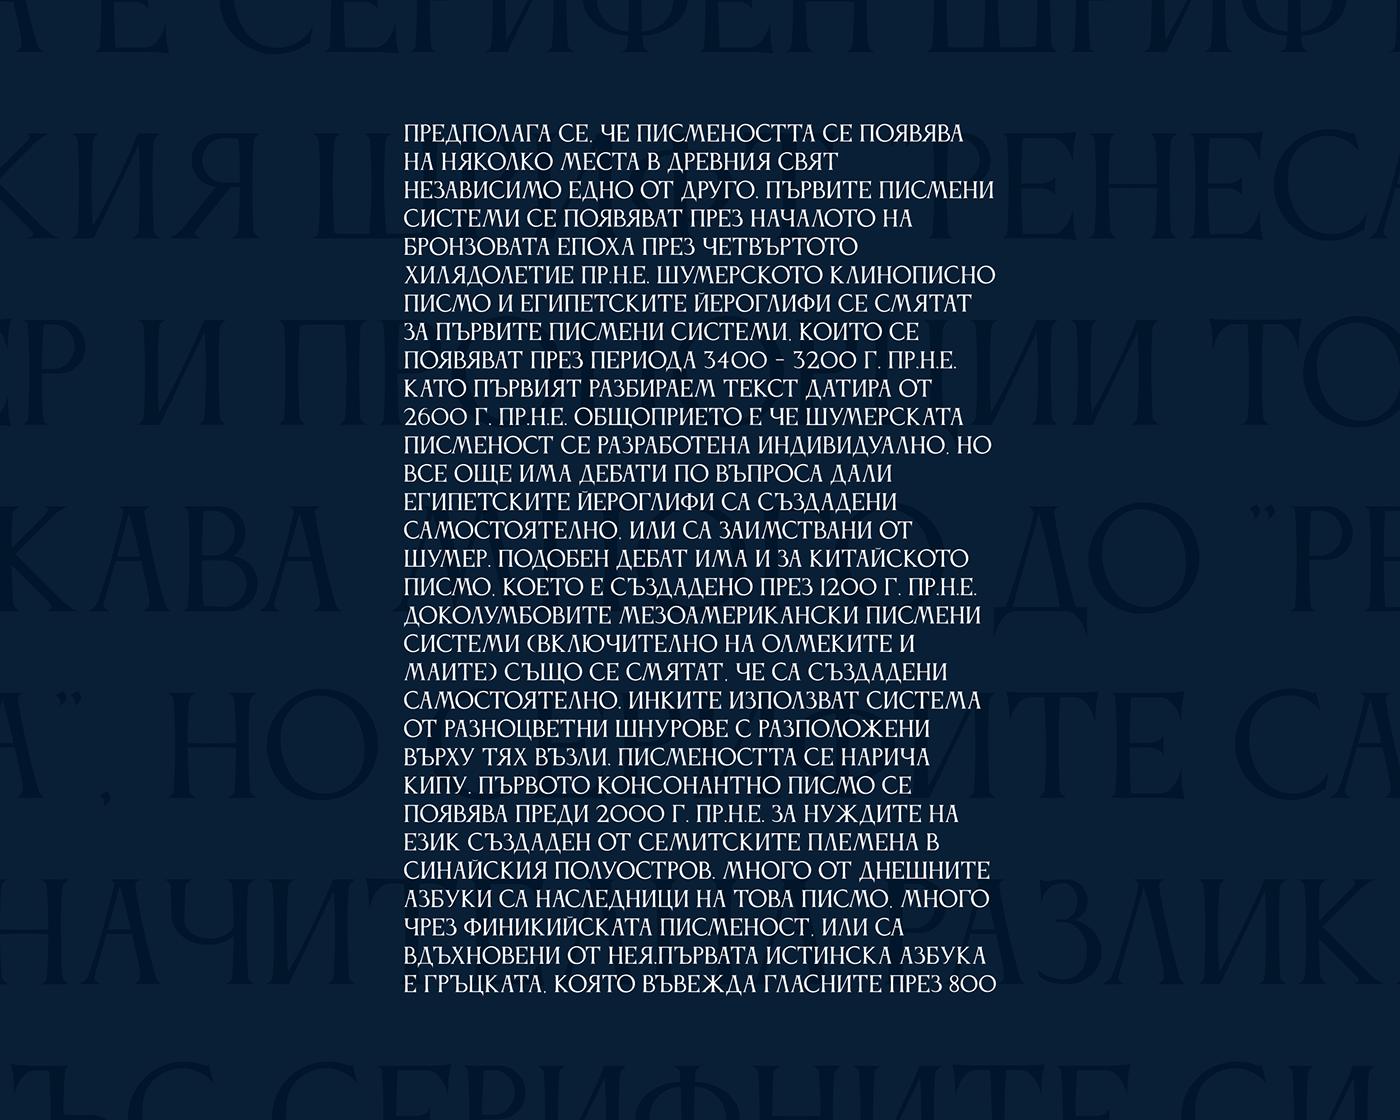 Anticva Free Font - cyrillic